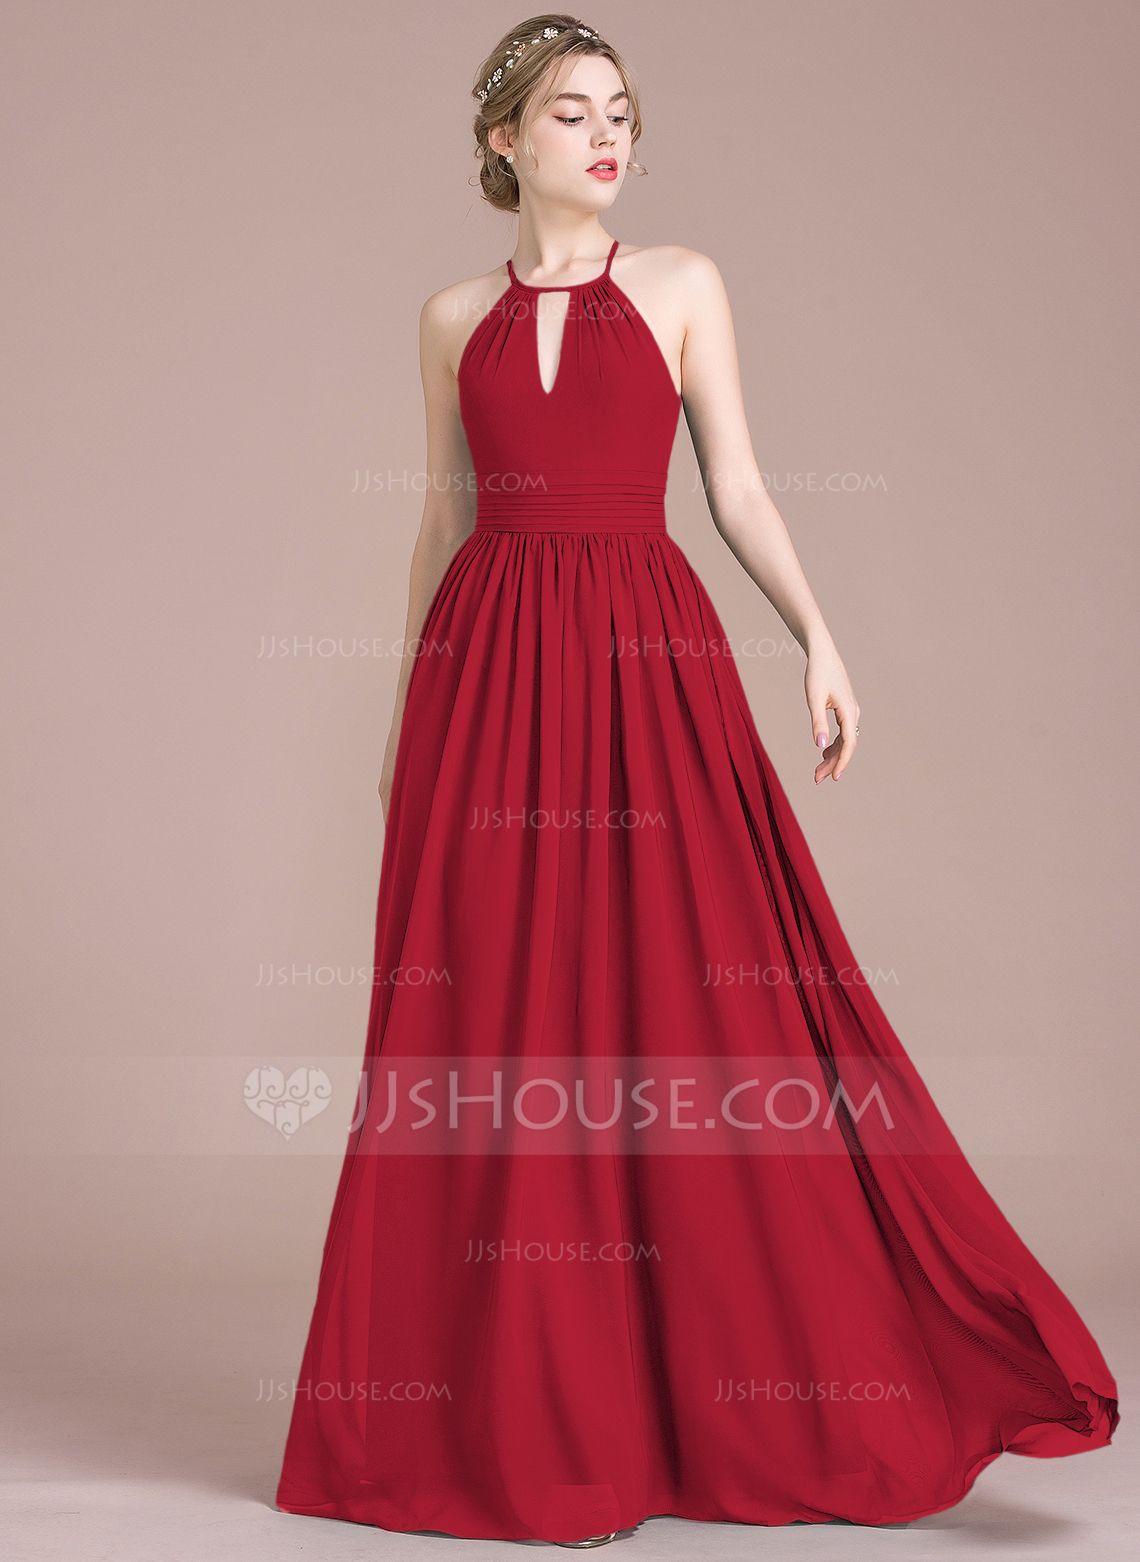 9b5479b7c A-Line/Princess Scoop Neck Floor-Length Chiffon Bridesmaid Dress With  Ruffle (007105577) - Bridesmaid Dresses - JJsHouse